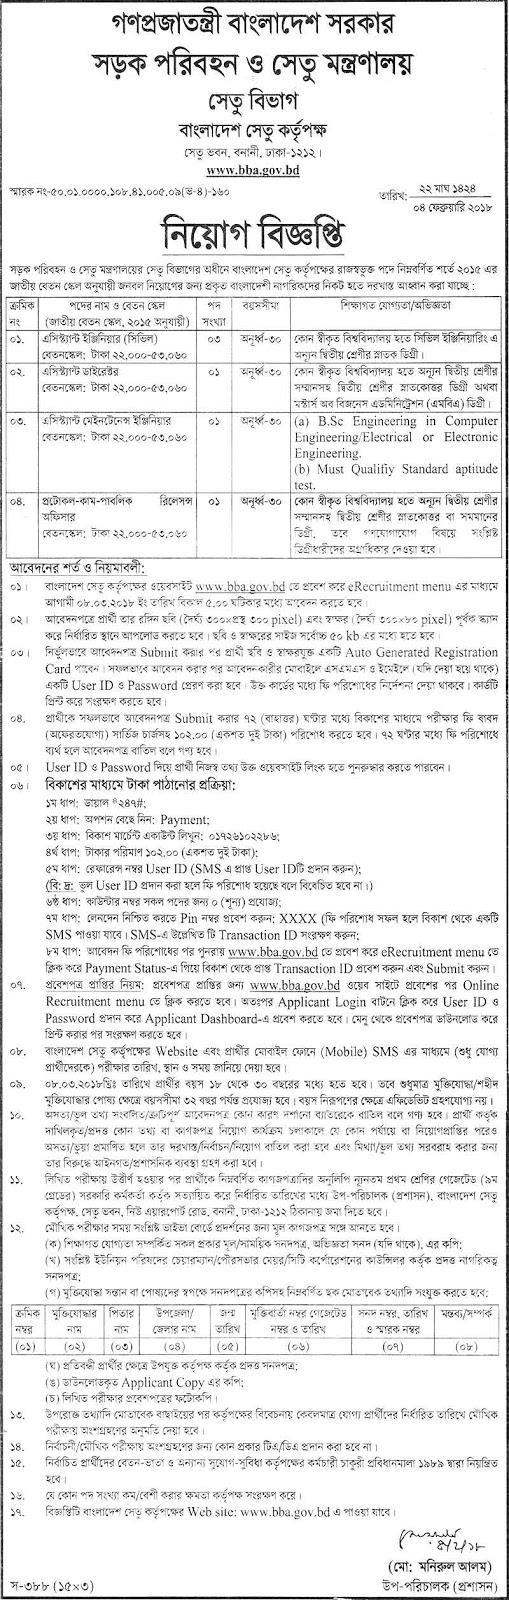 Bangladesh Bridge Authority Job Circular 2018 bba.gov.bd 2